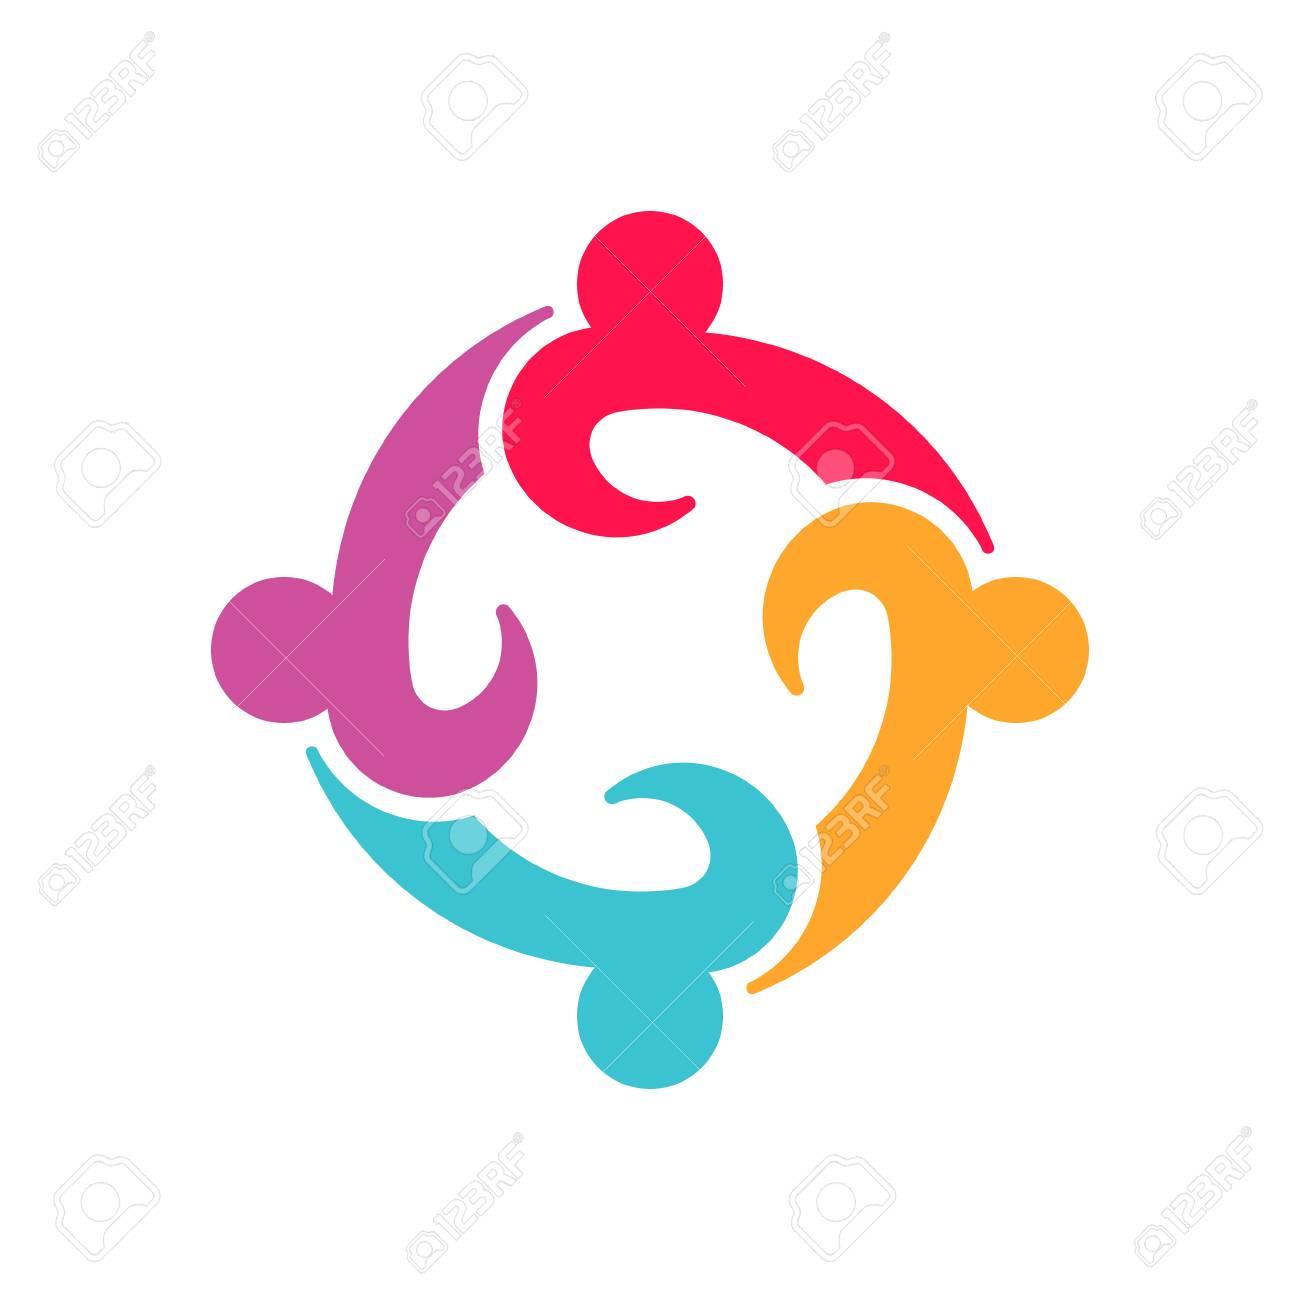 Four Entrepenurs teamwork people logo design - 115757807